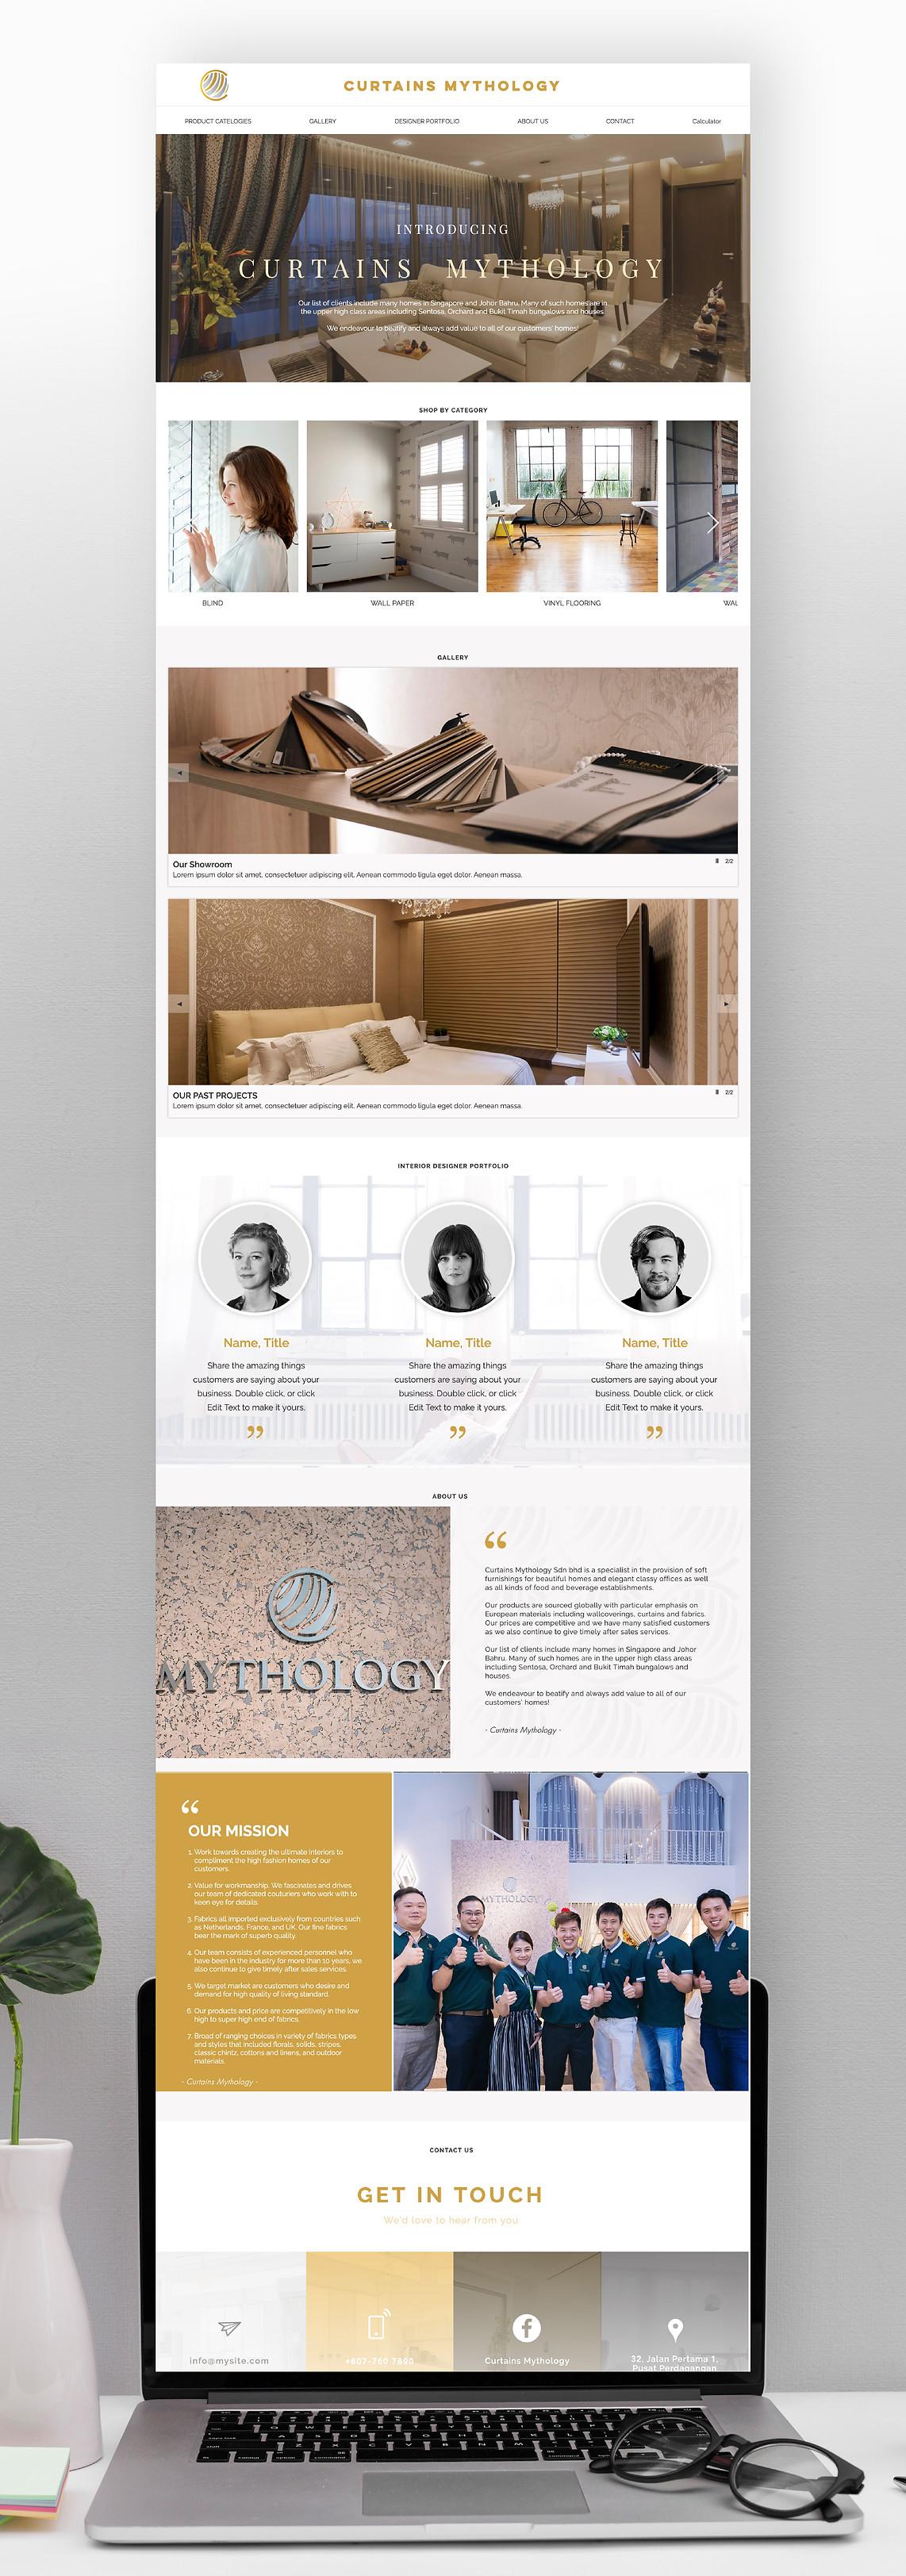 branding-Curtains-01.jpg